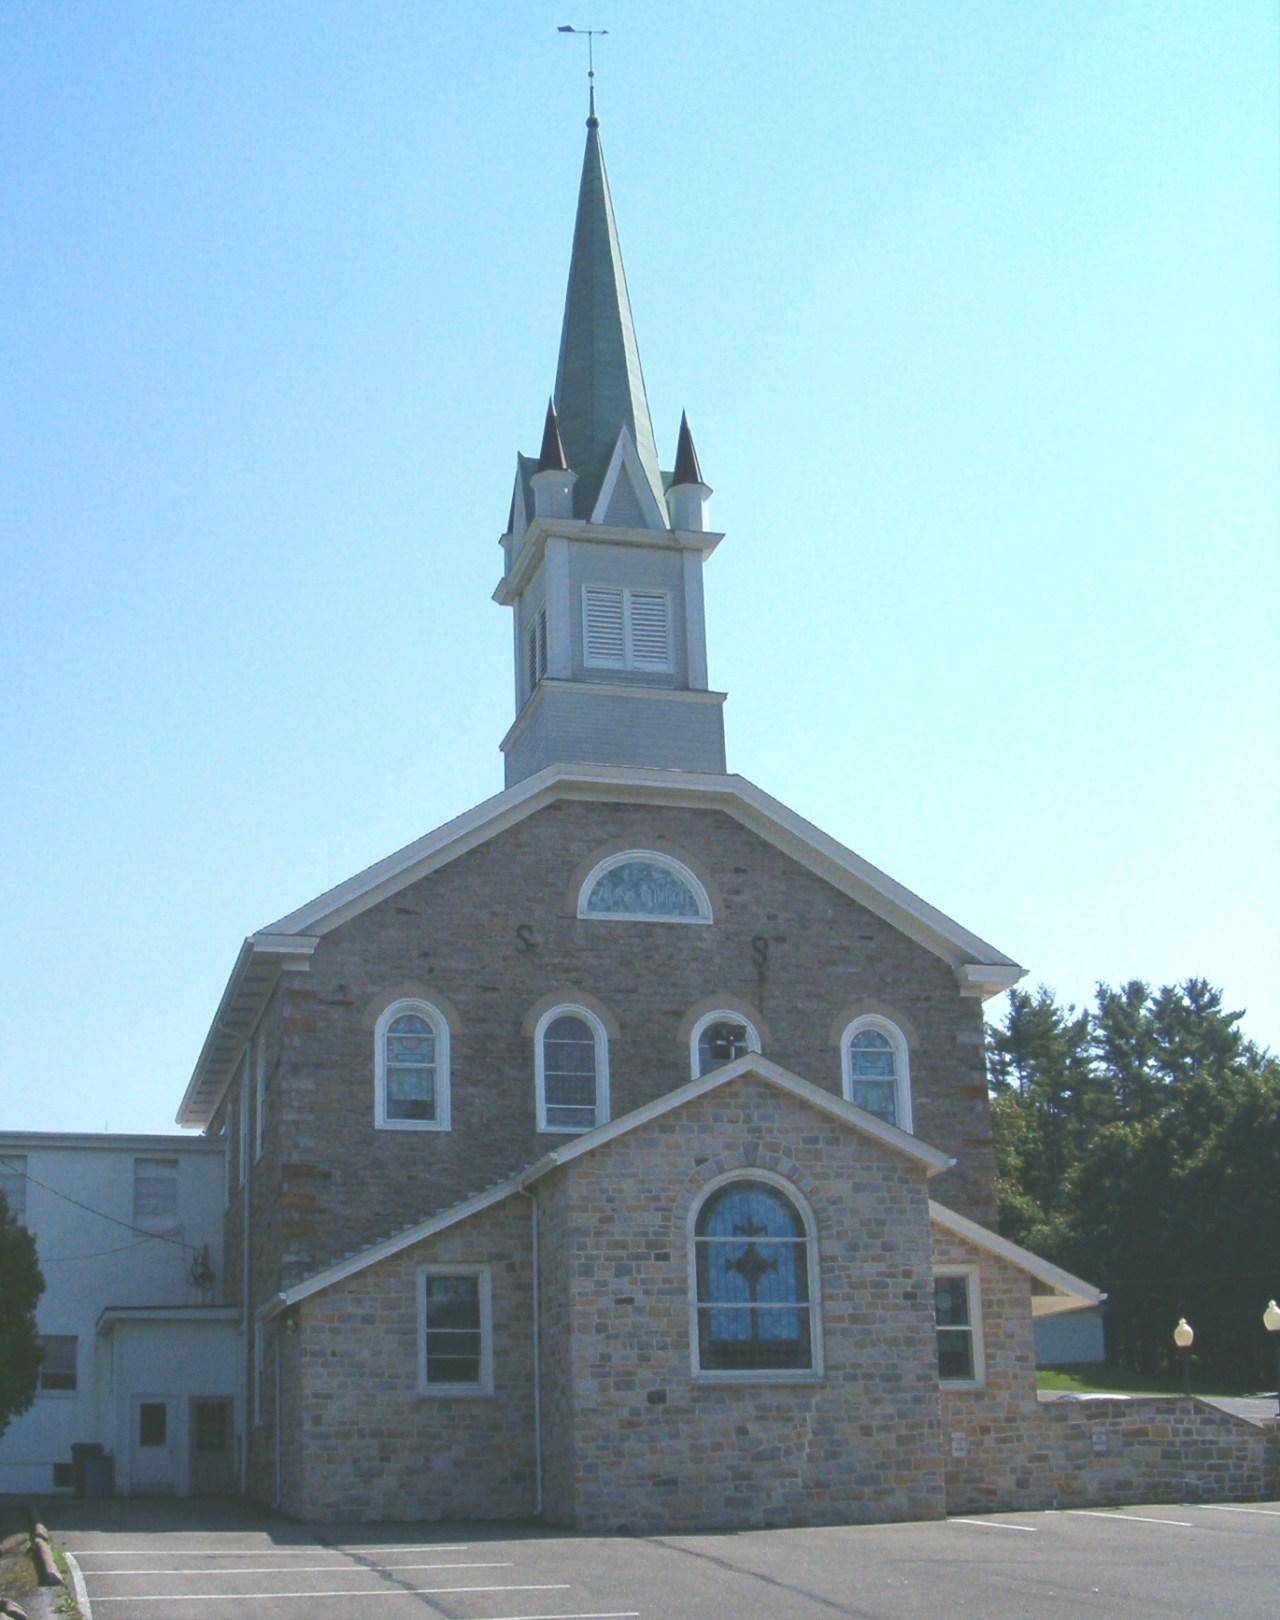 zions stone church